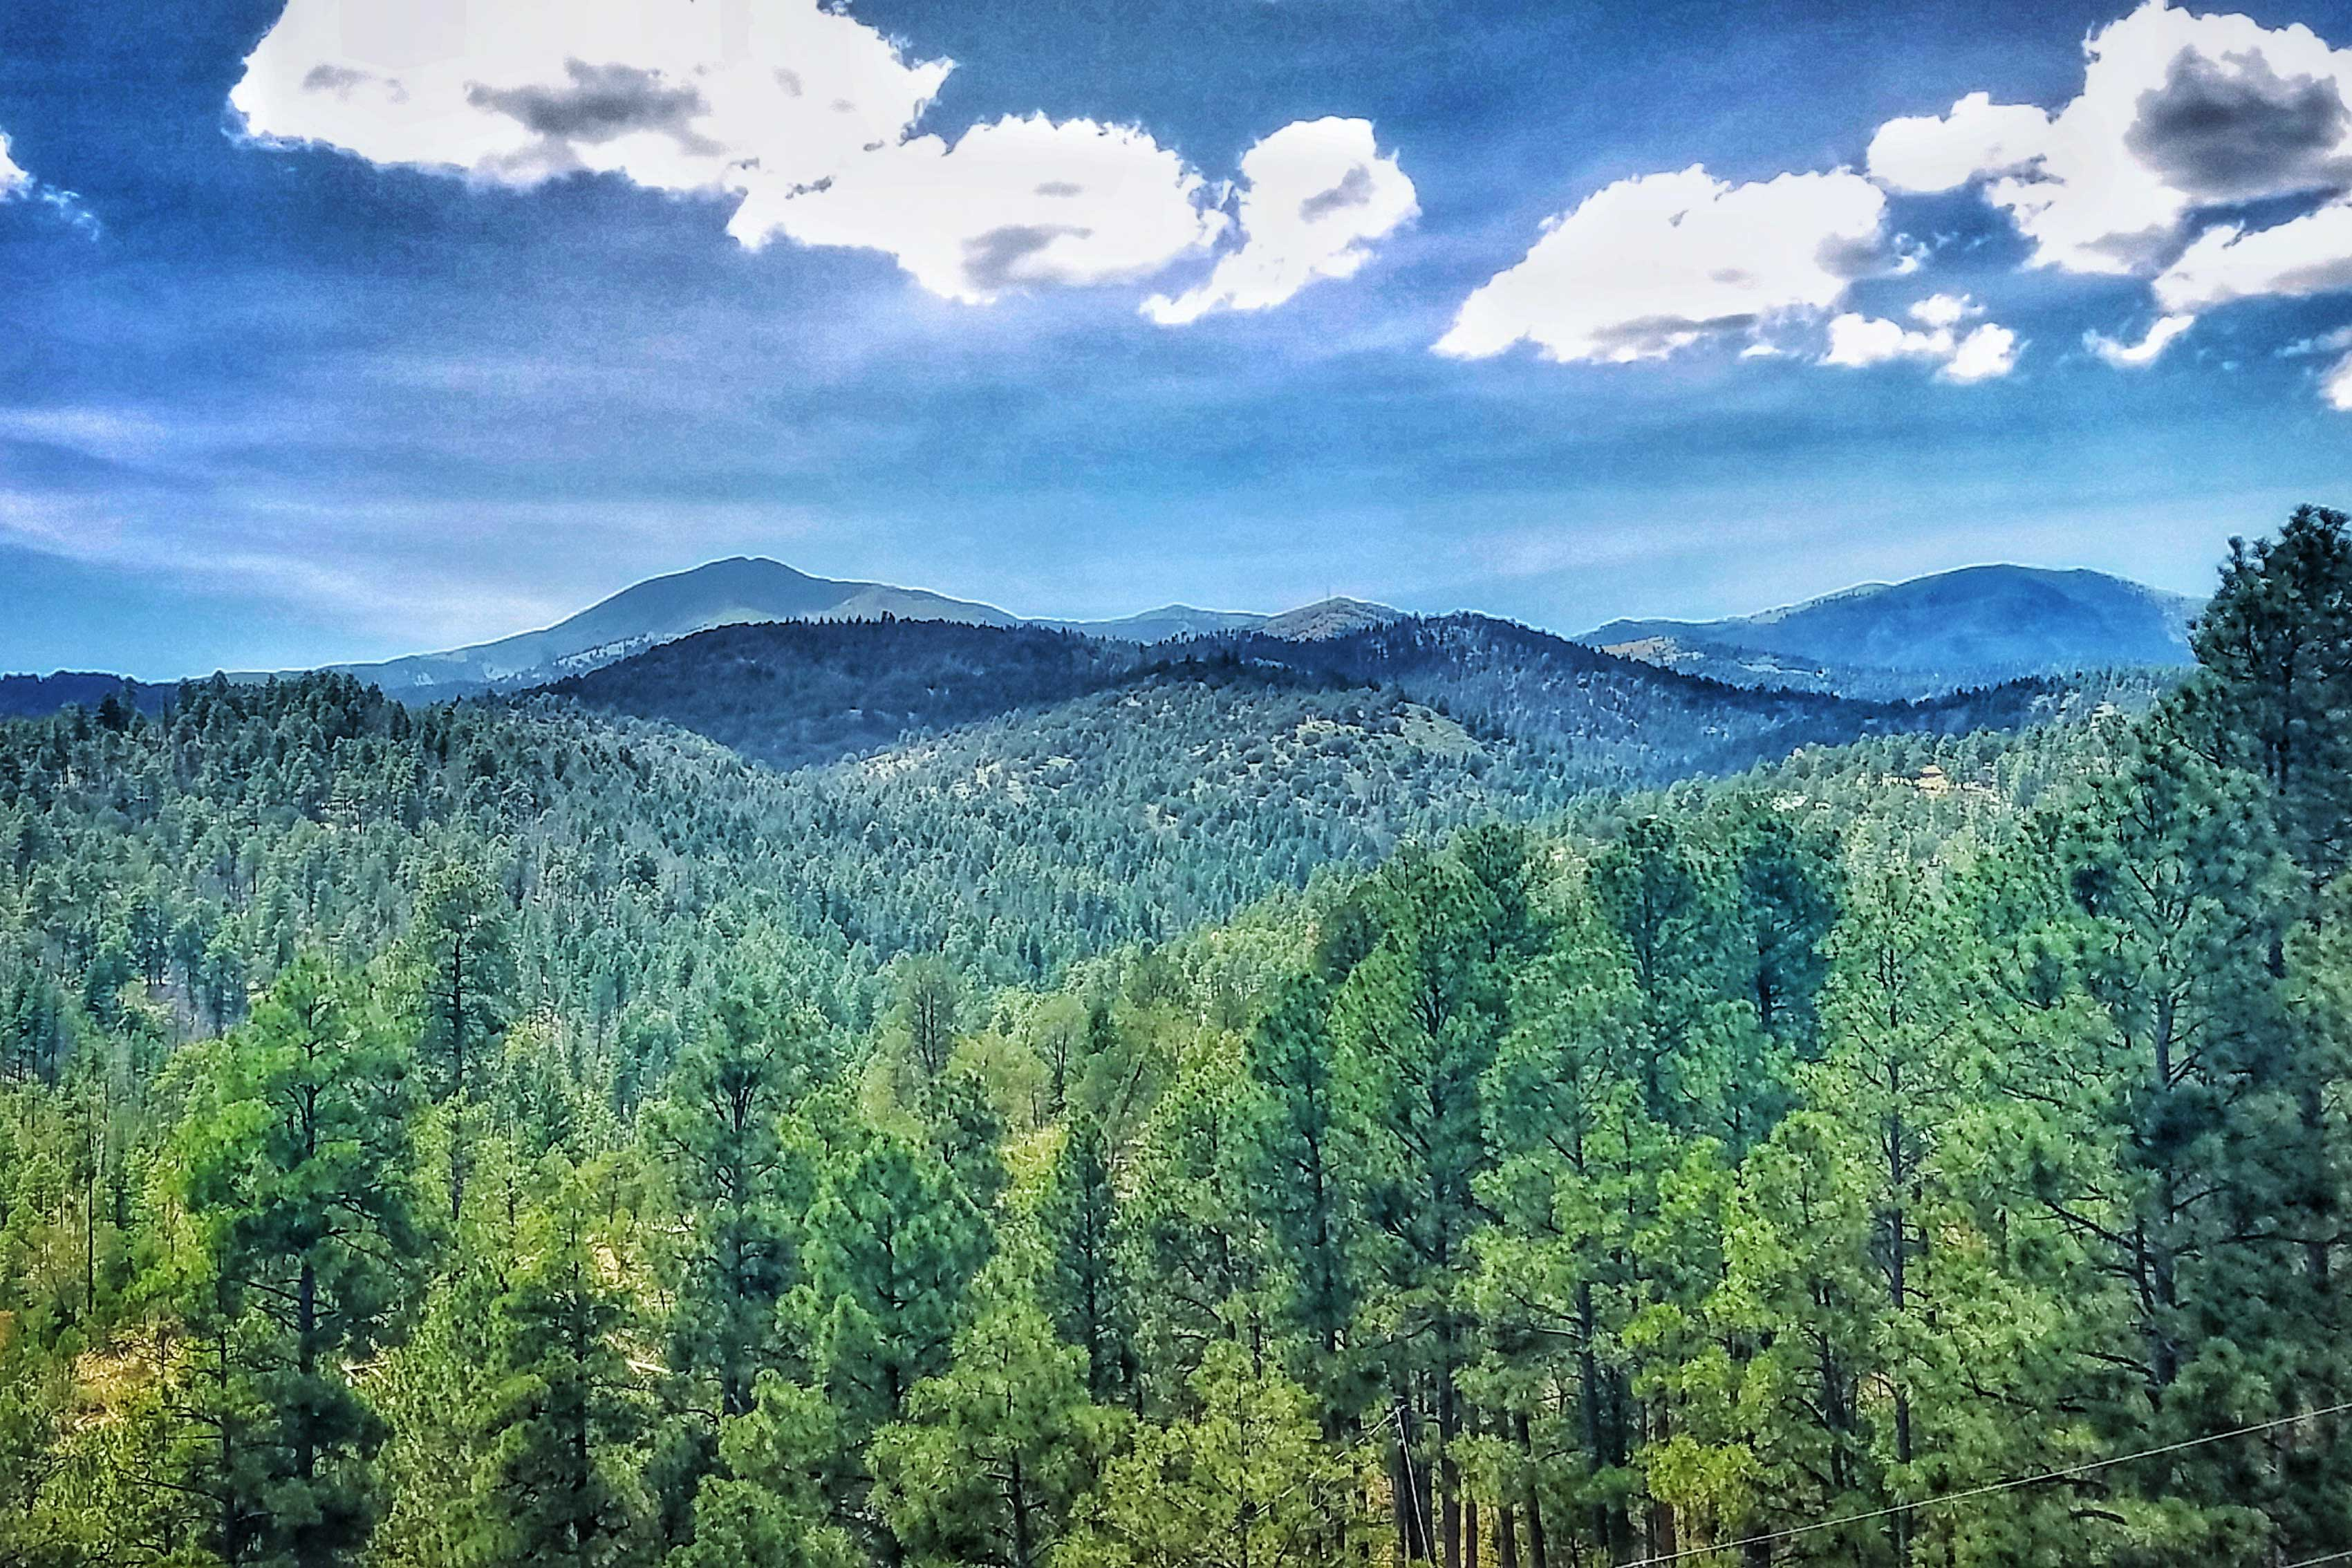 Incredible mountain views await!